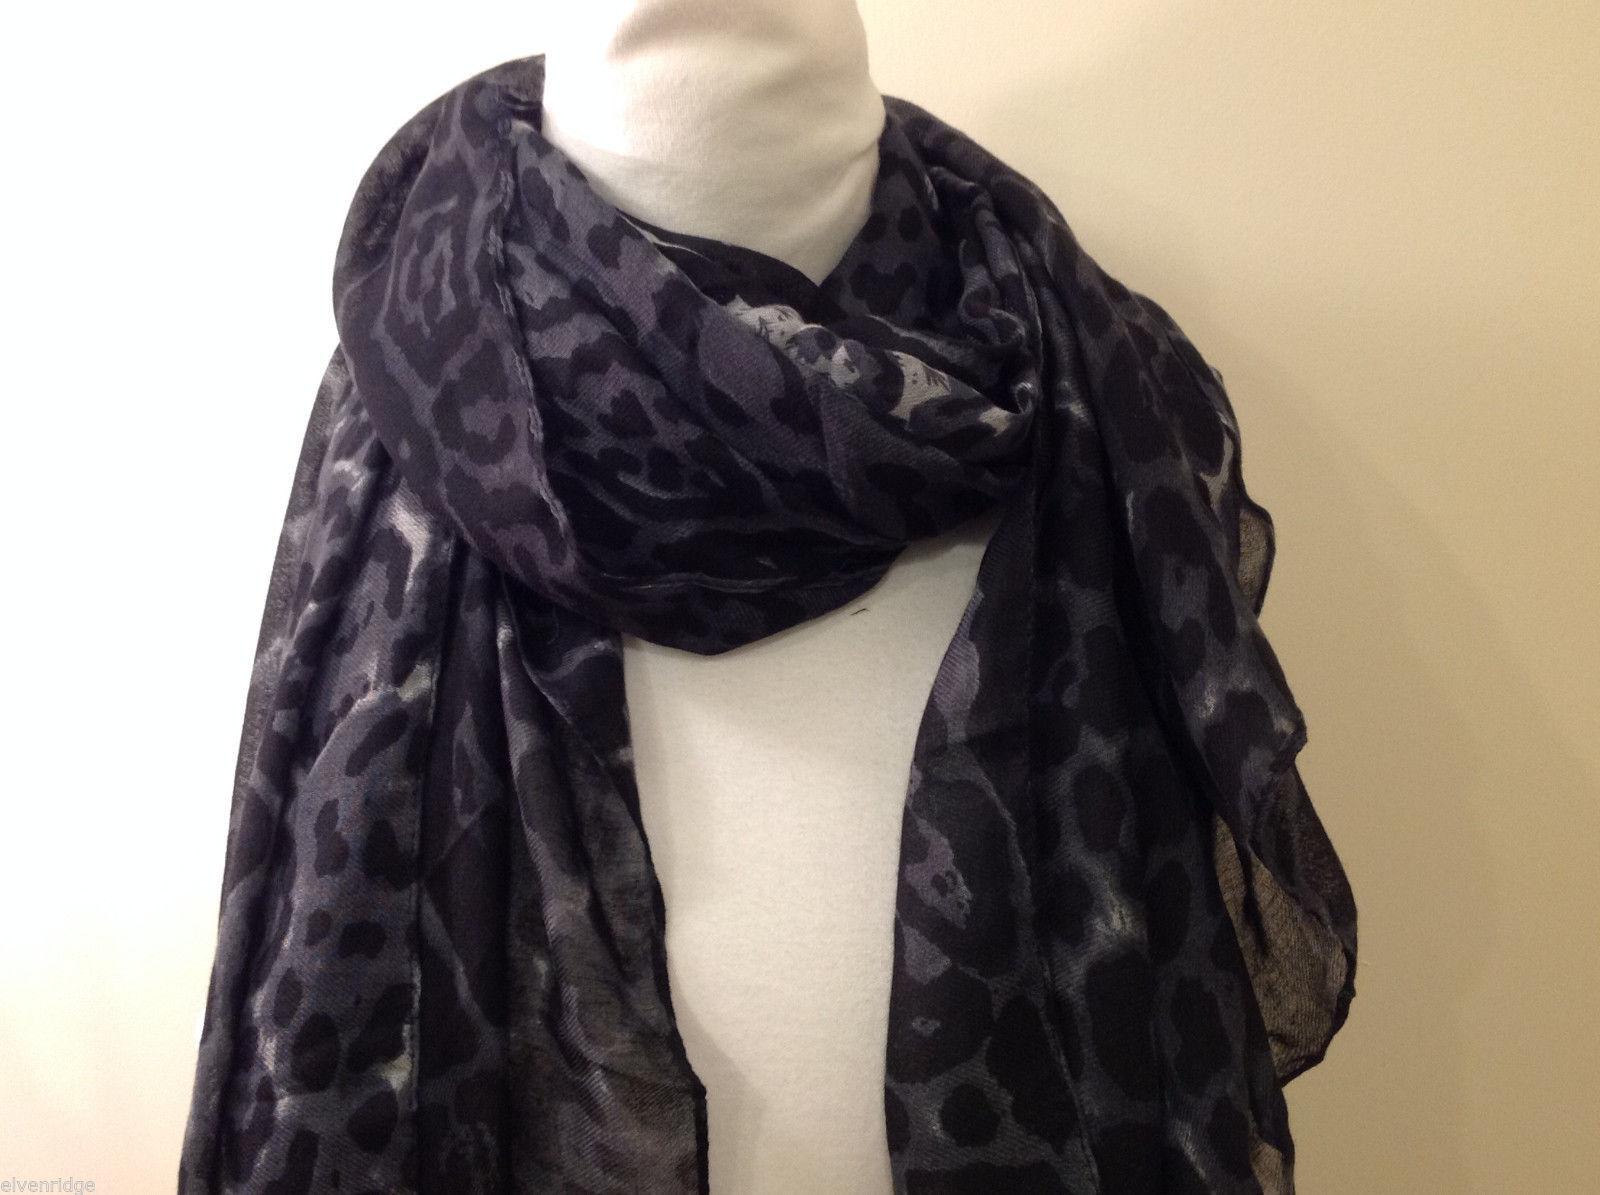 Rectangle Jaguar or Cheetah Print 100% Polyester Gray Black Scarf Wrap - NEW